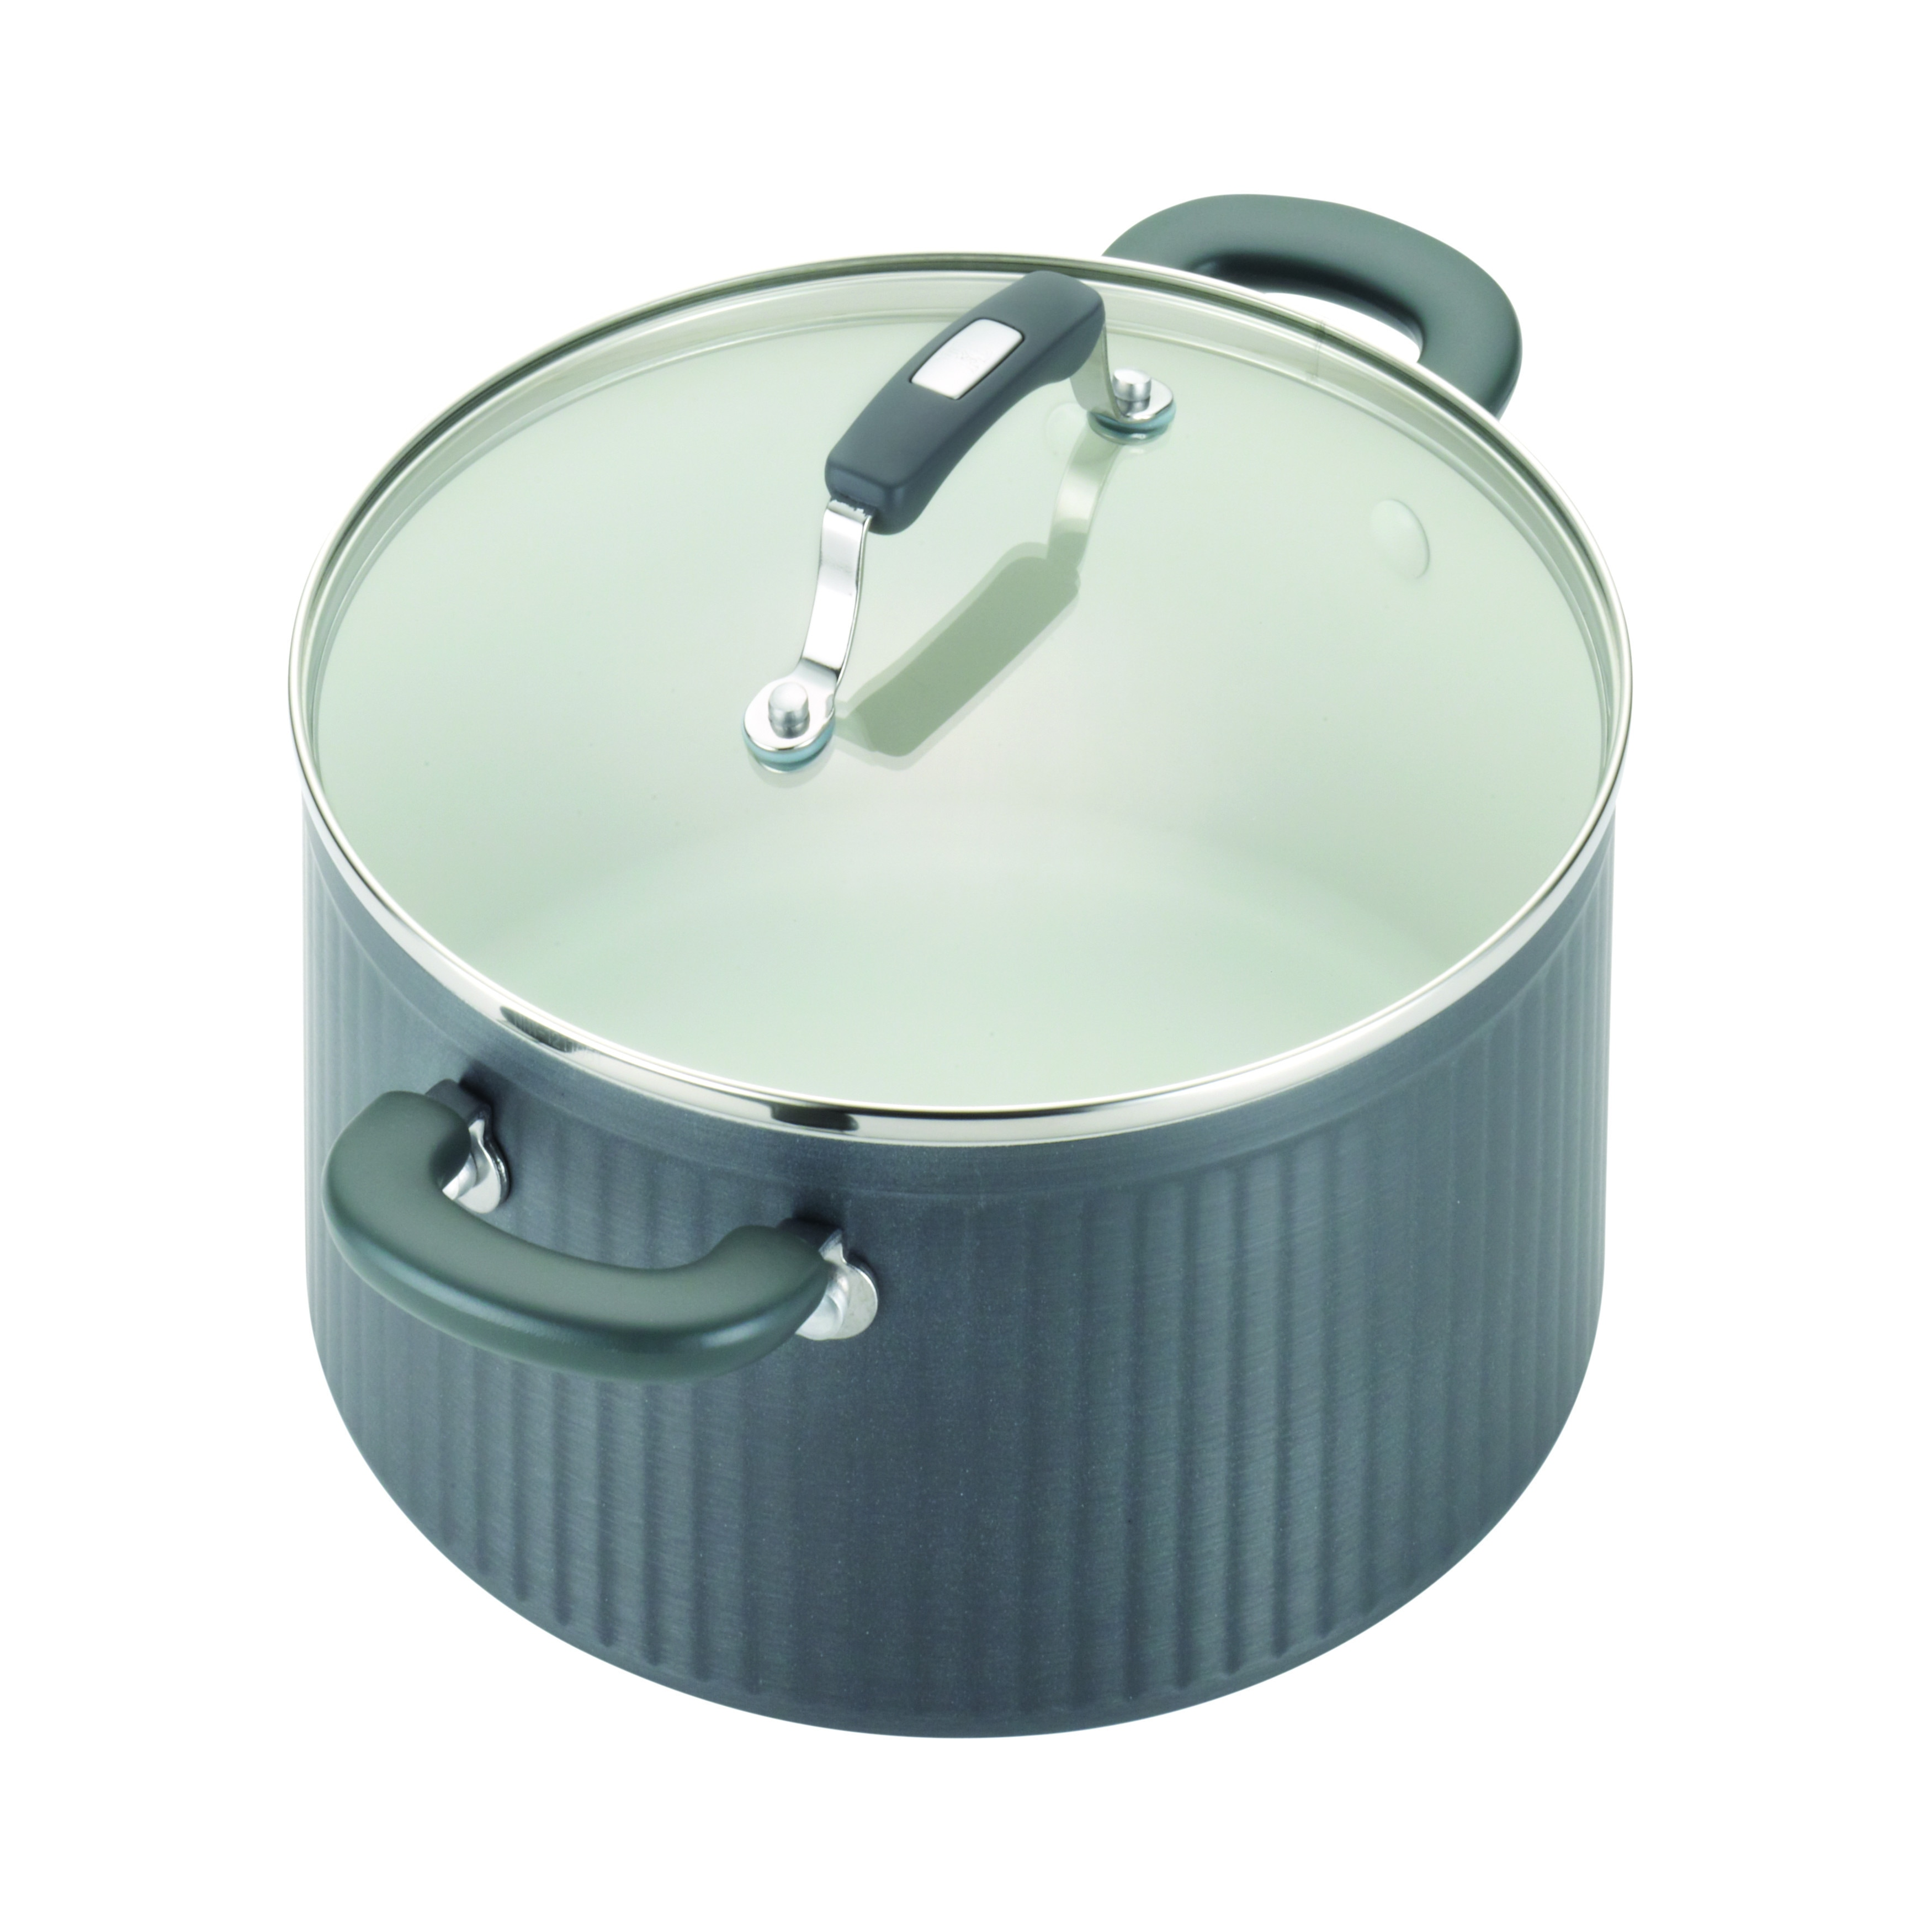 Paula Deen Savannah Collection Hard Anodized Nonstick 10 Piece Cookware Set Gray Free Shipping Today 17422222